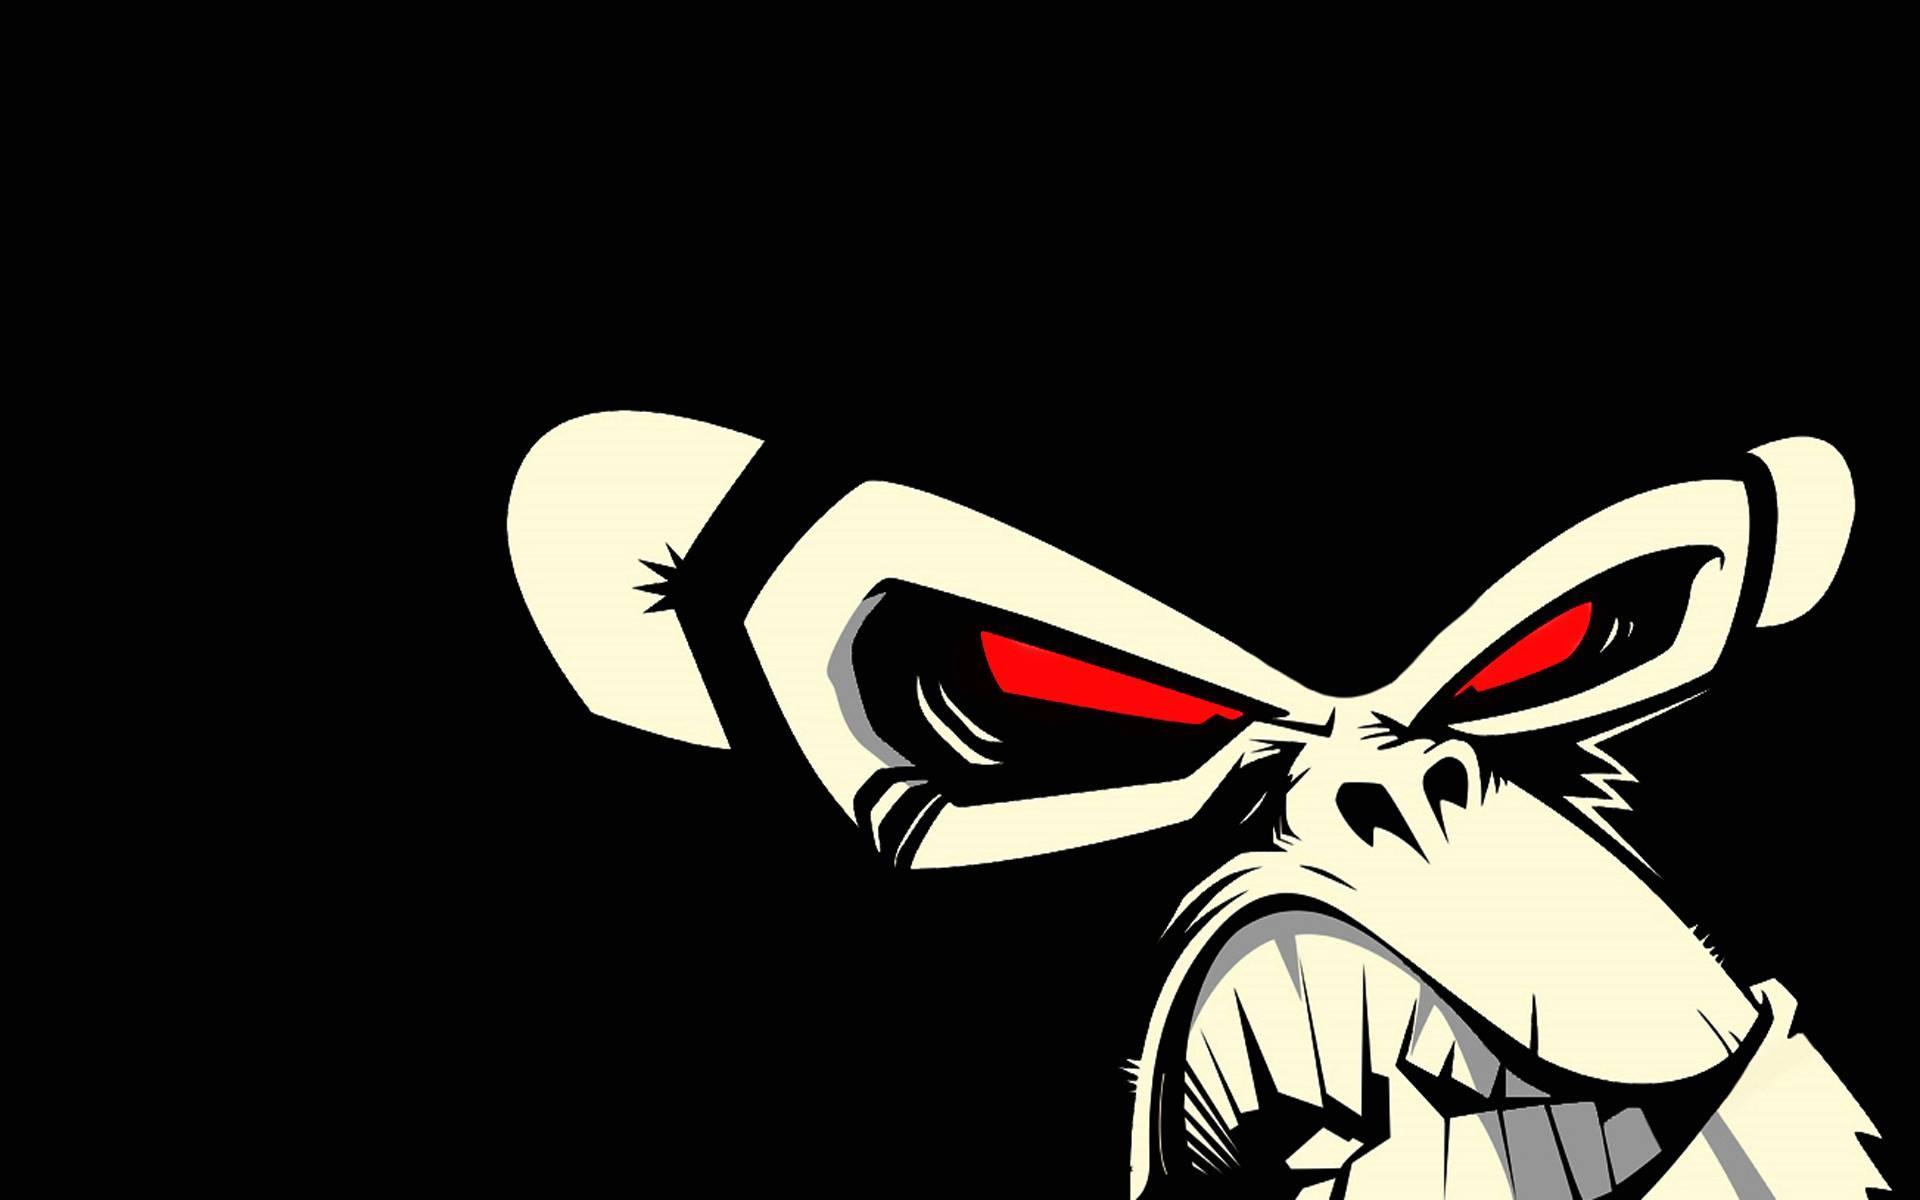 Wallpaper Ilustrasi Gambar Kartun Mata Merah Coretan Monyet